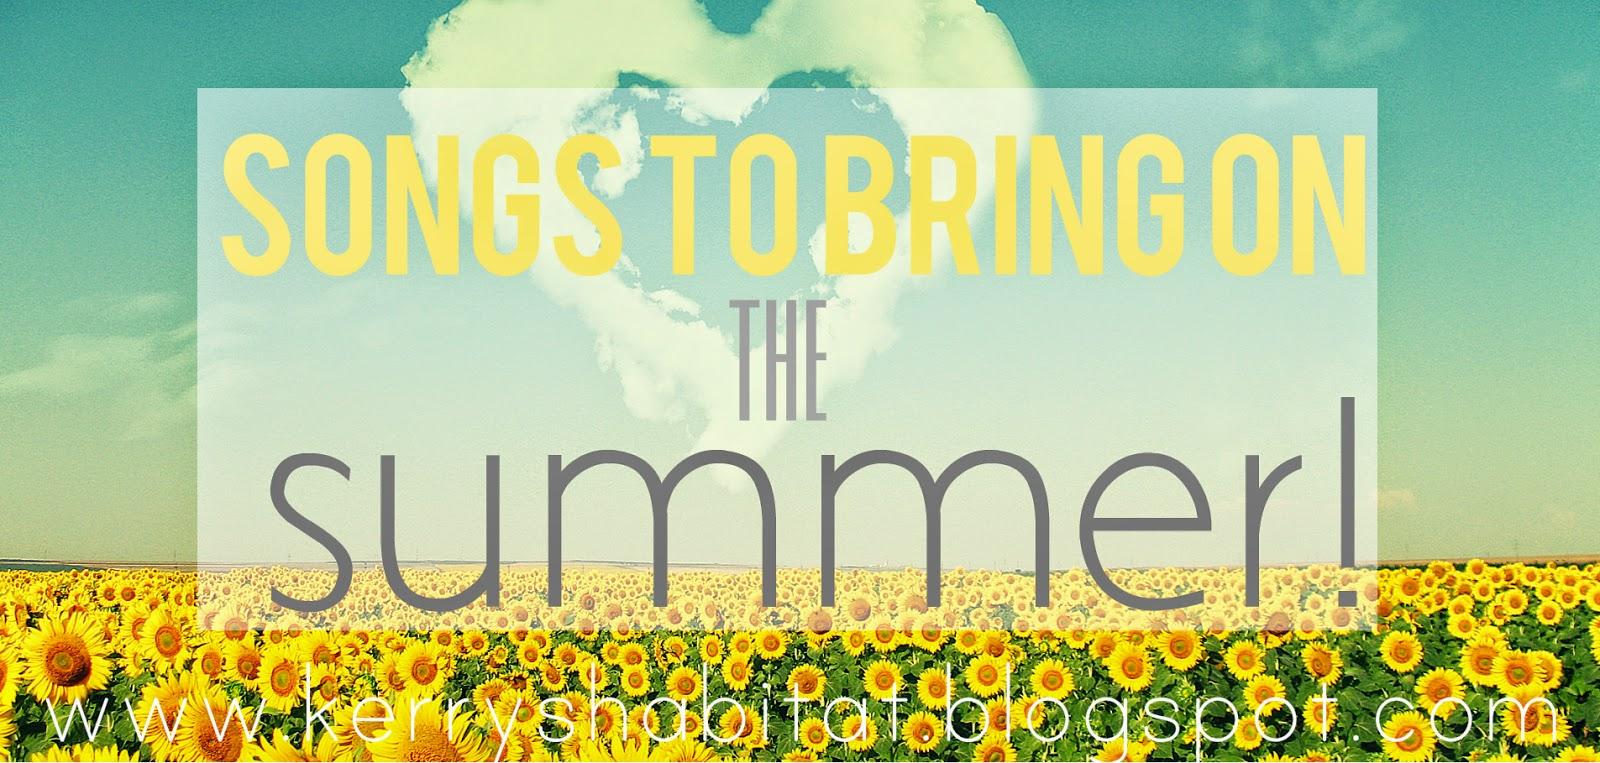 http://kerryshabitat.blogspot.co.uk/2014/03/songs-to-bring-on-summer.html